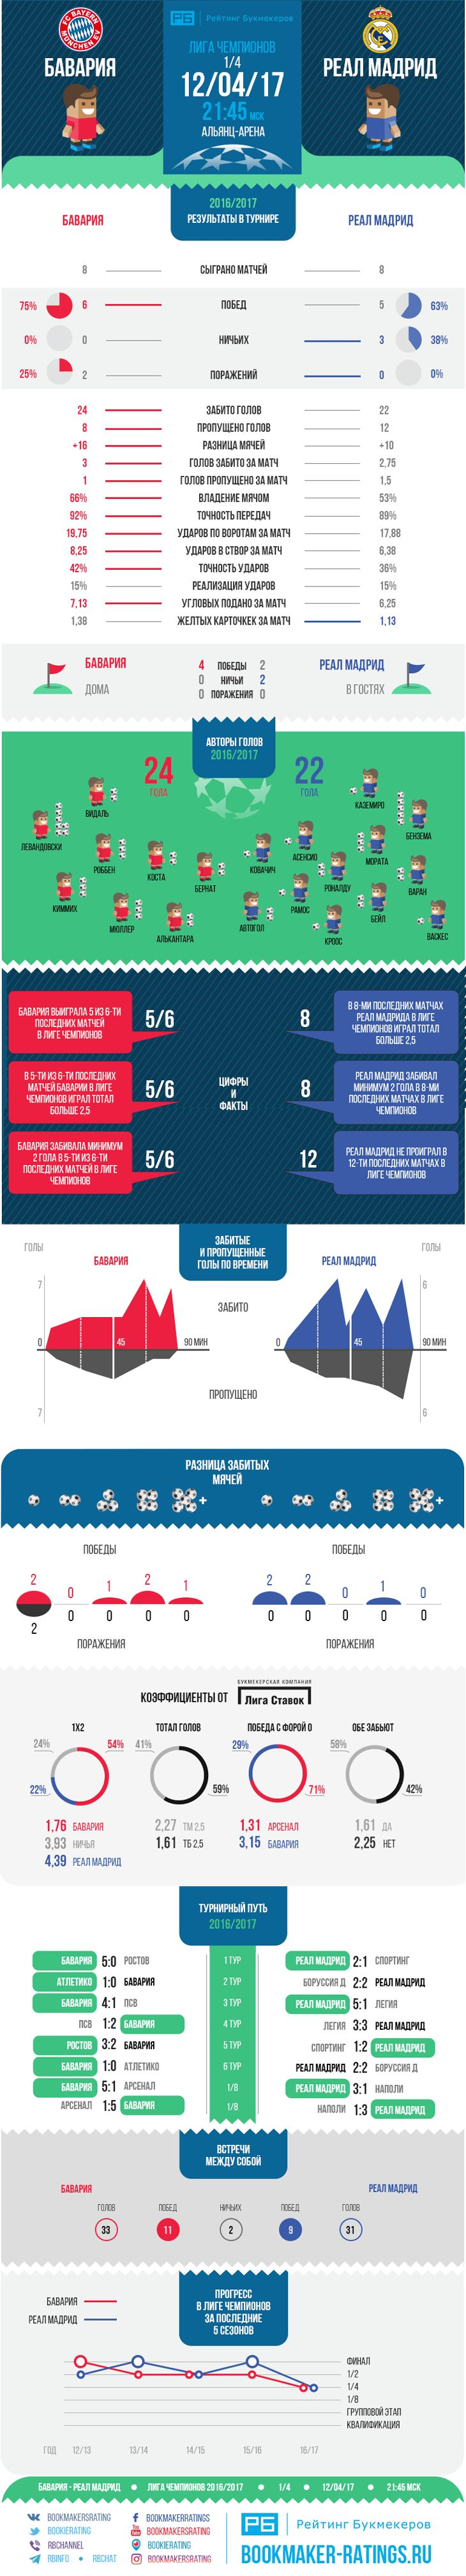 Статистика для матча Бавария  Реал Мадрид от Рейтинга Букмекеров